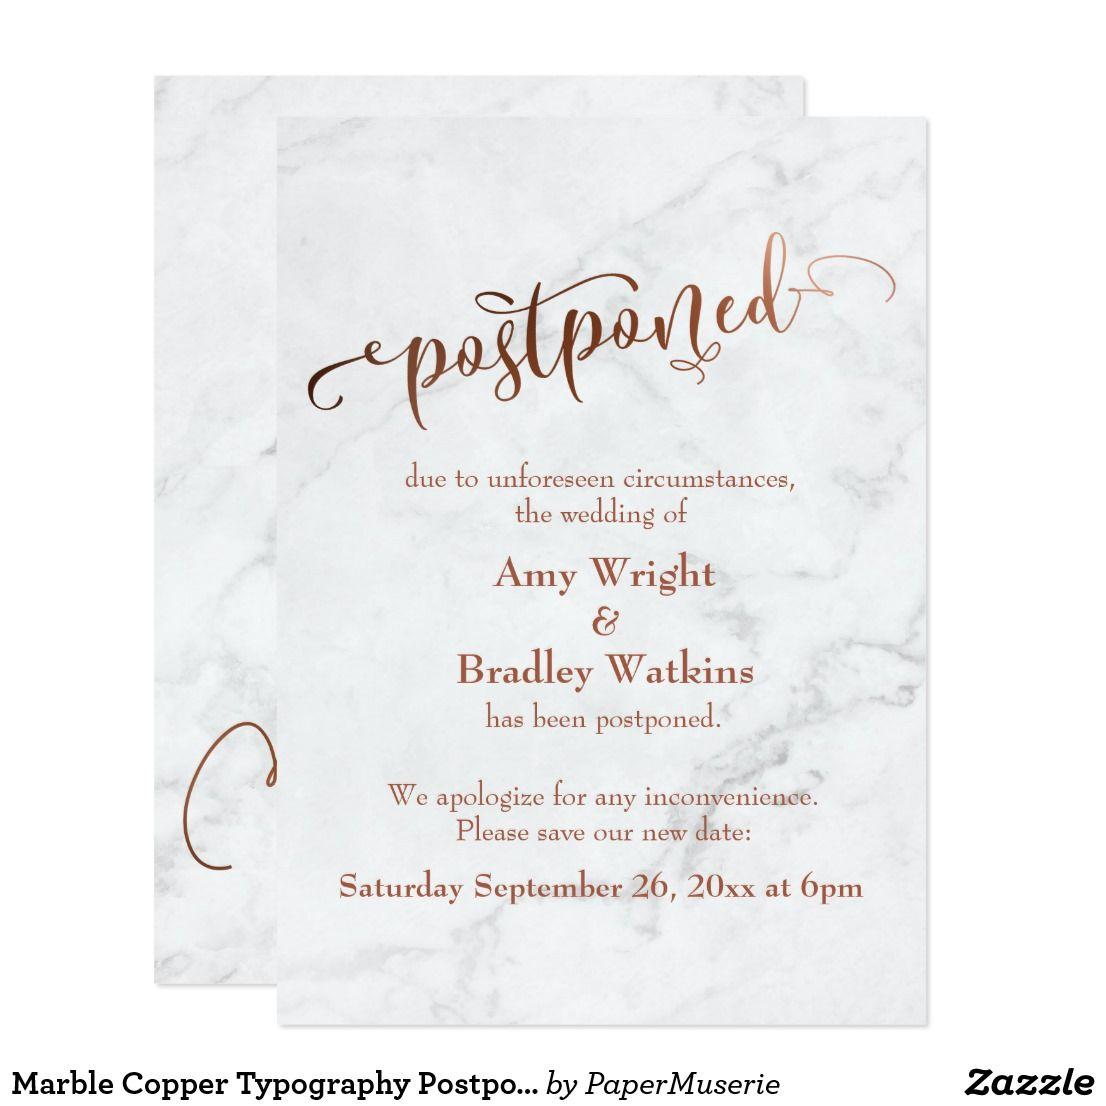 Marble Copper Typography Postponed Wedding Invitation